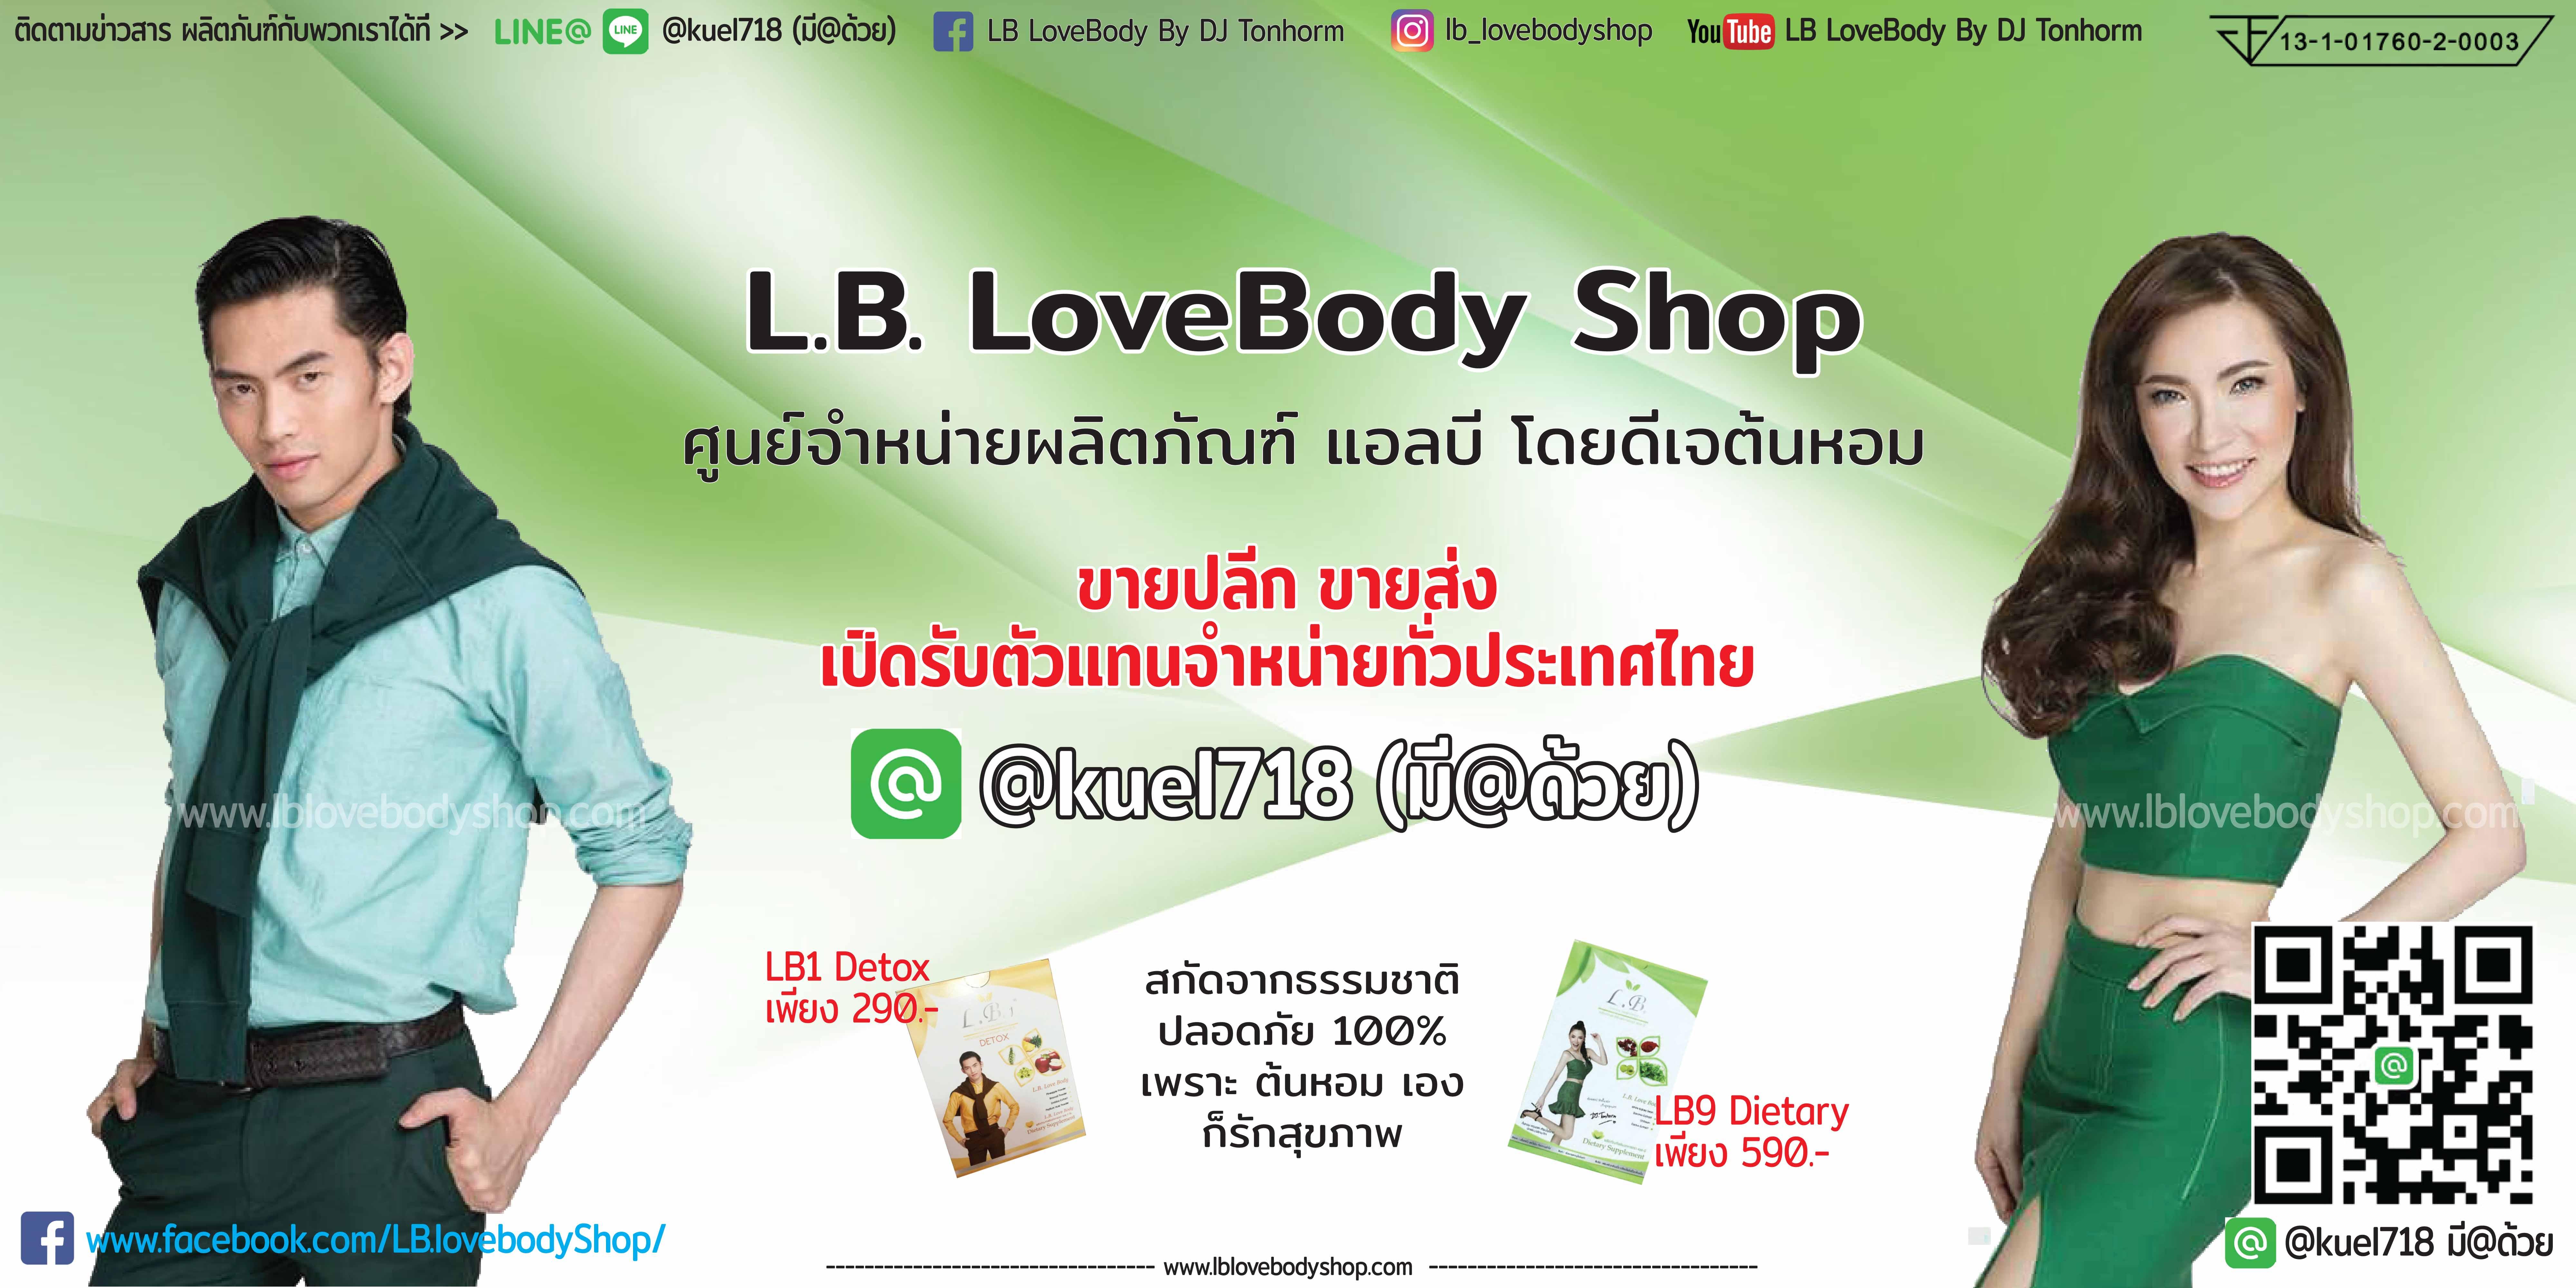 LB LoveBody Shop by DJ Tonhorm